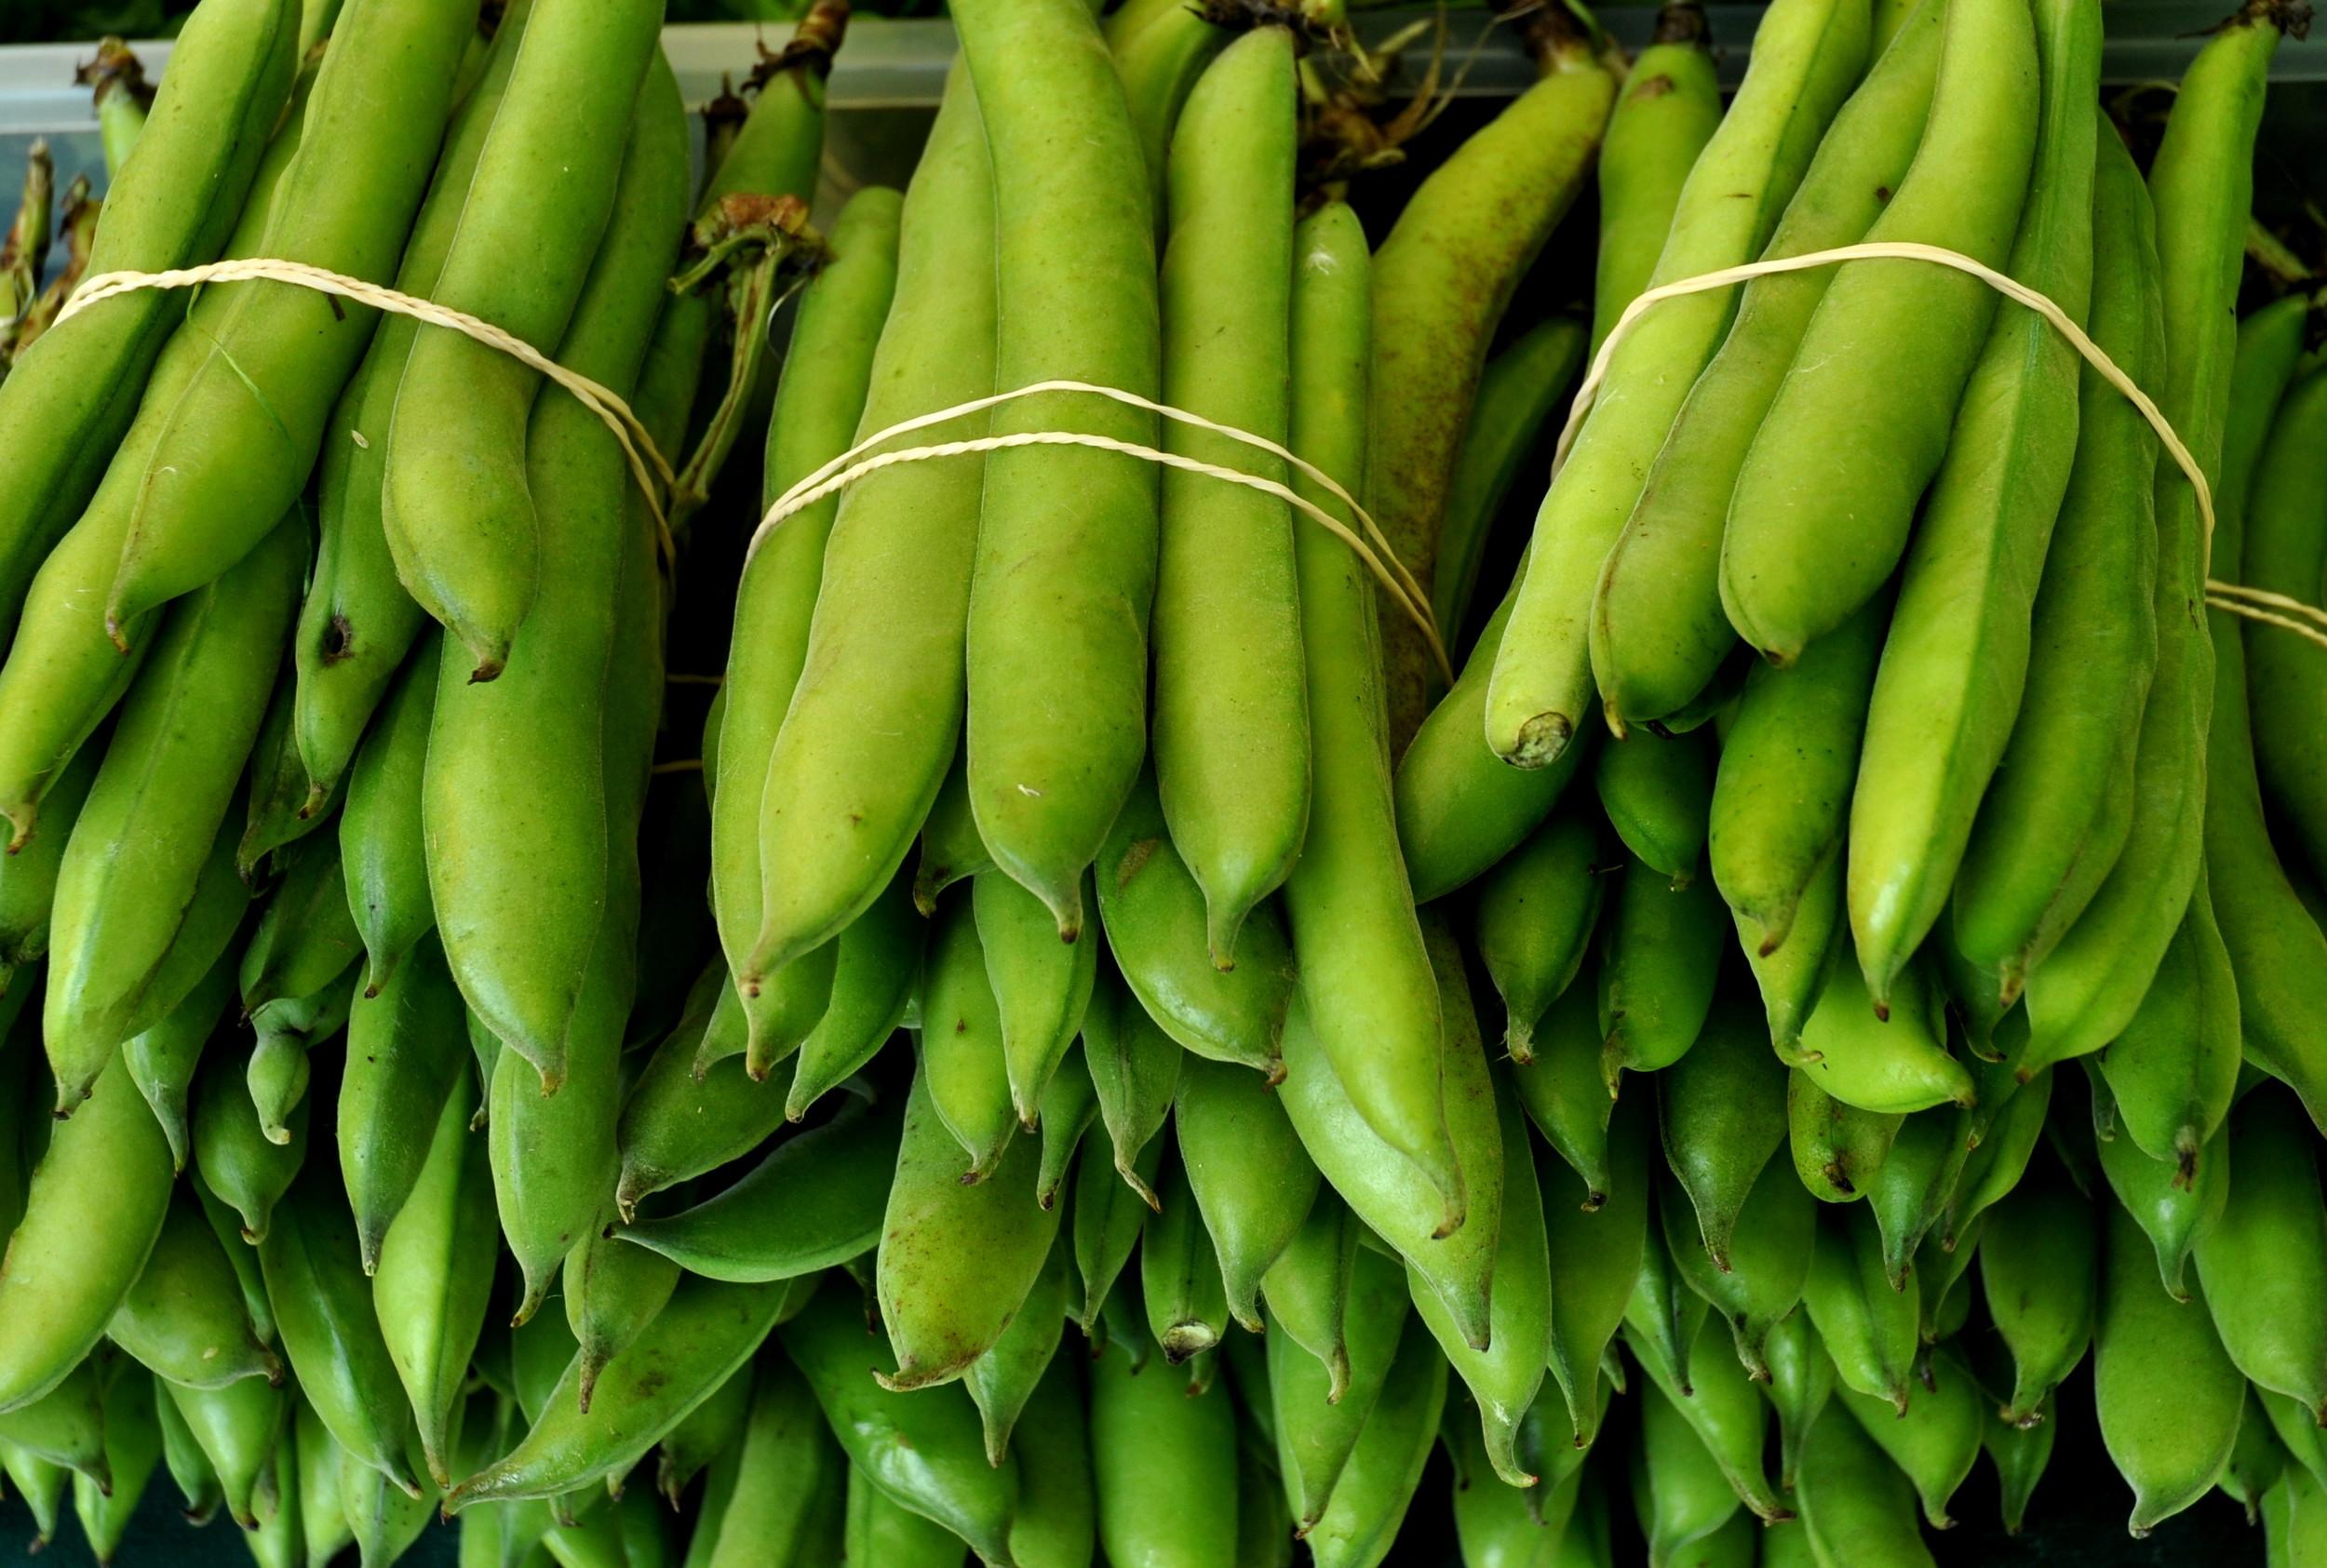 Fava beans from Children's Garden. Photo copyright 2013 by Zachary D. Lyons.